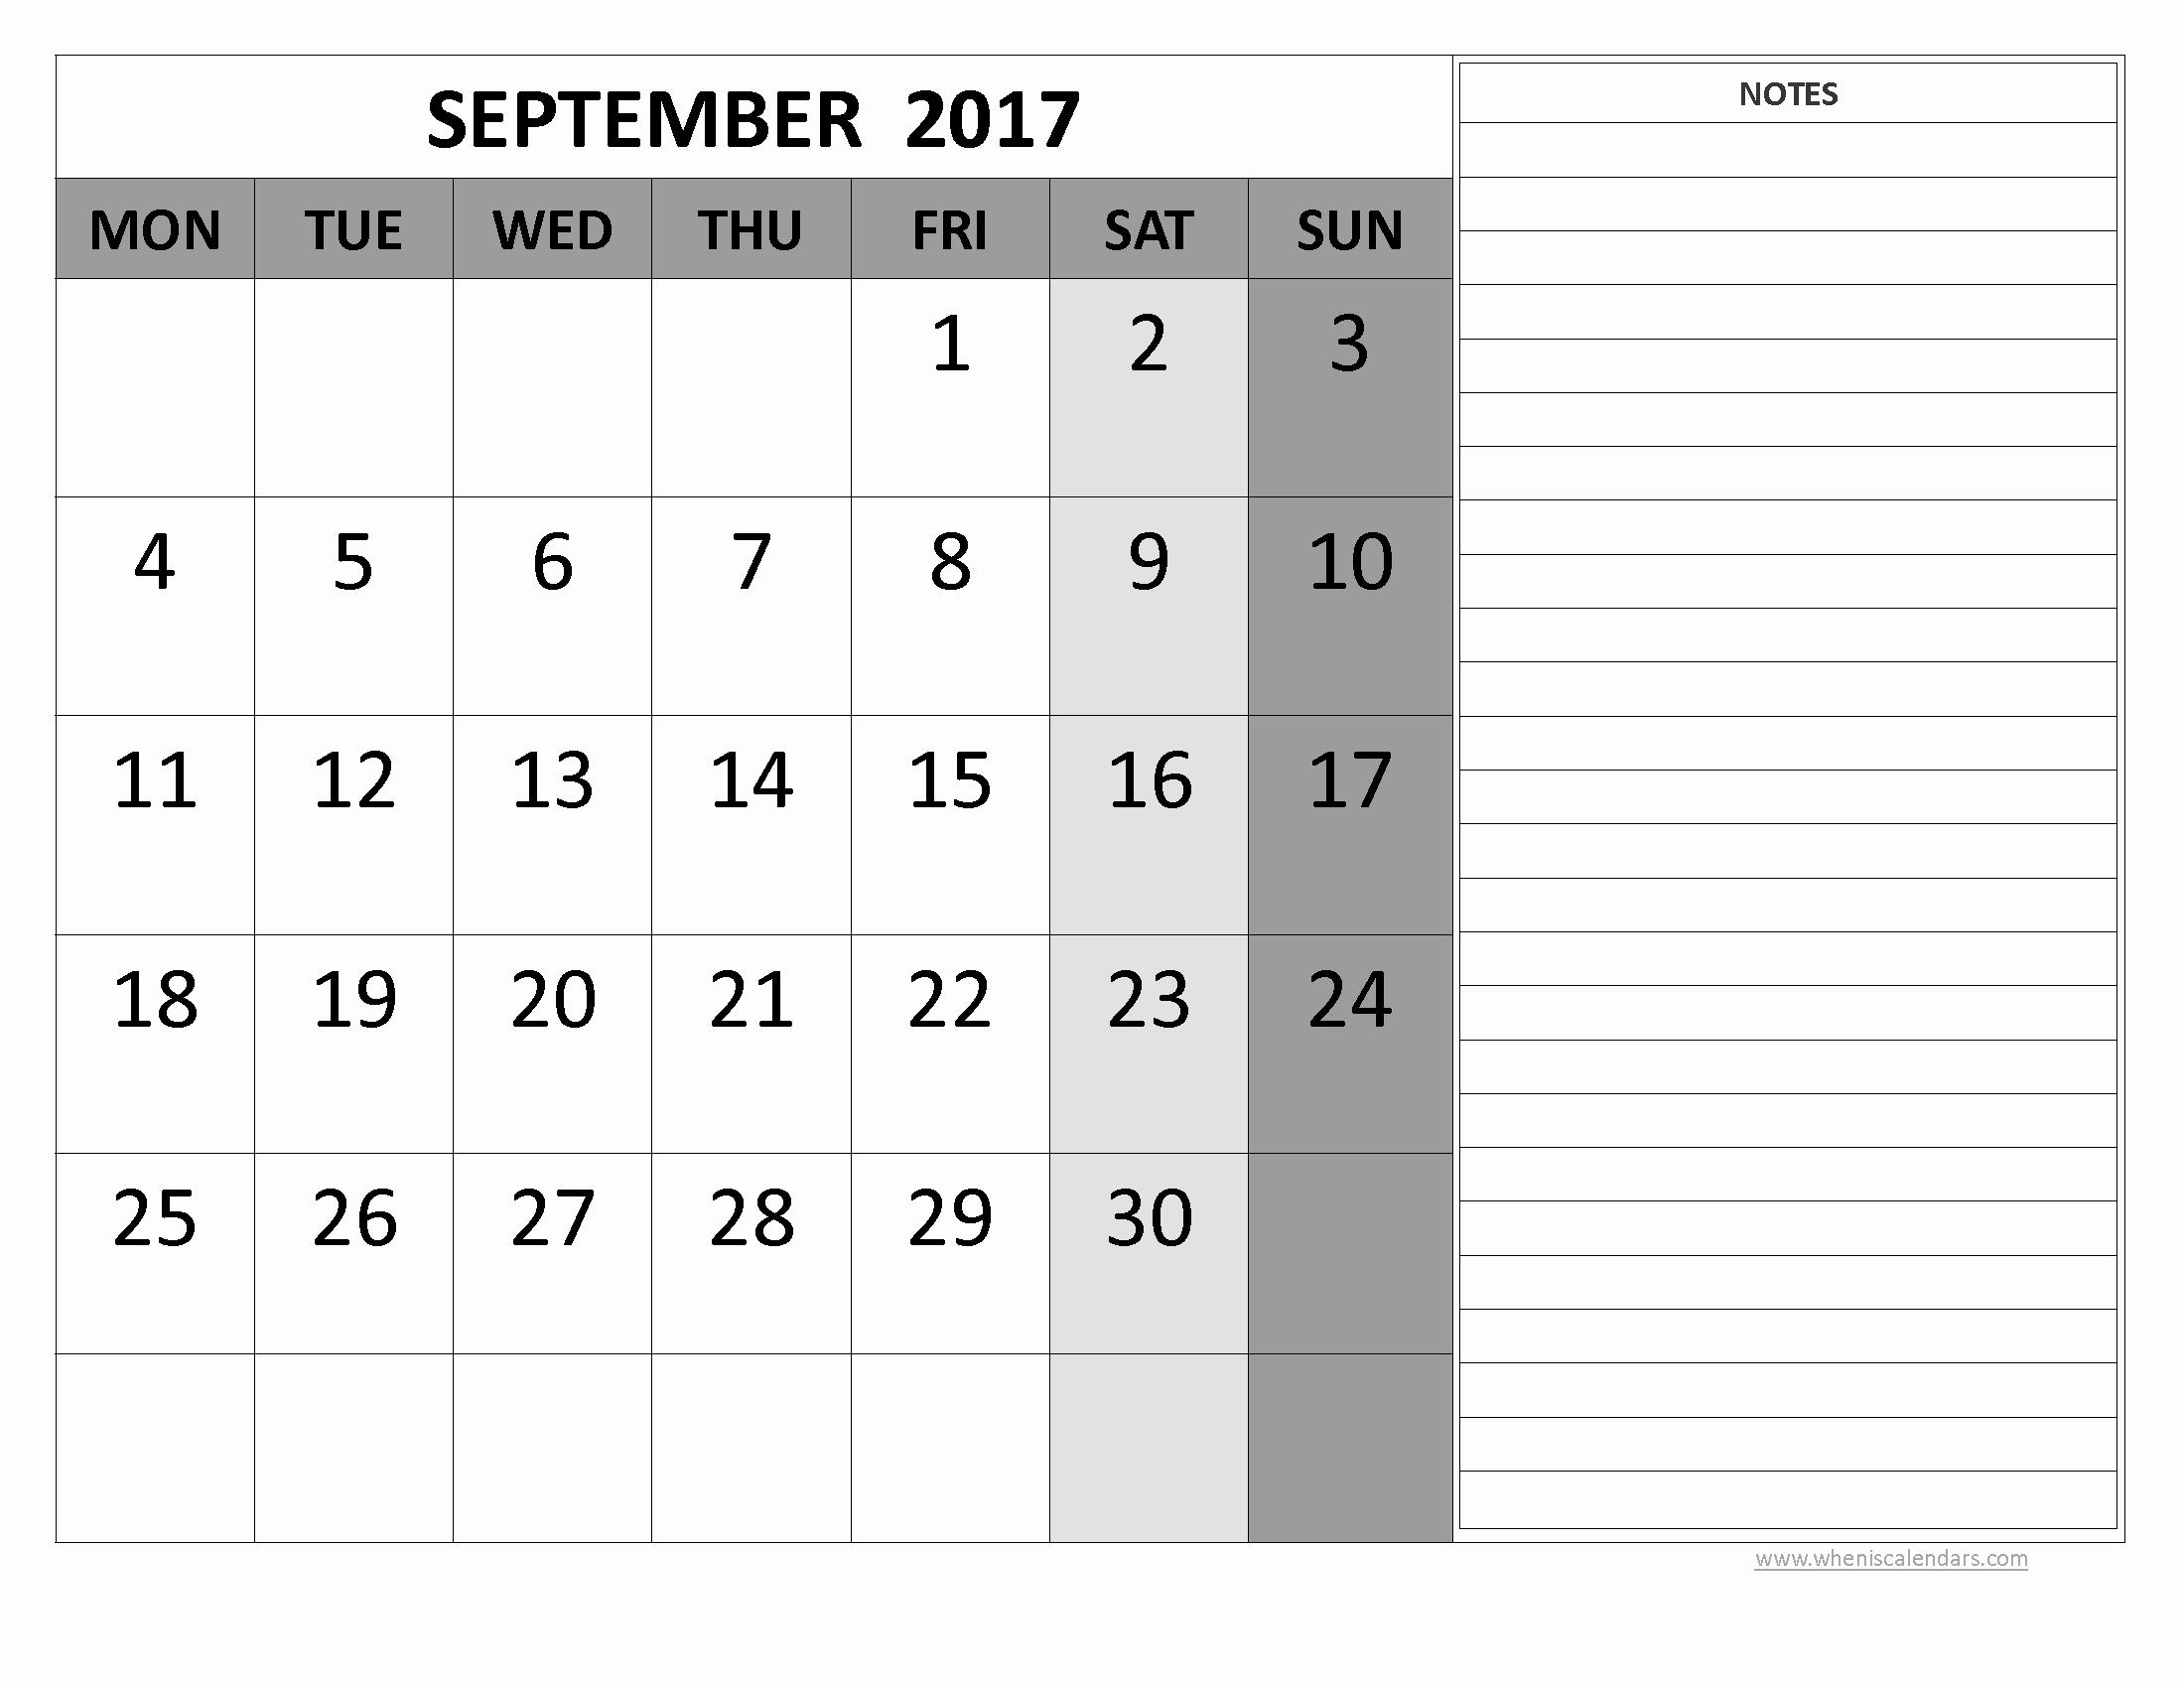 September 2017 Printable Calendar Word Best Of September 2017 Calendar Word